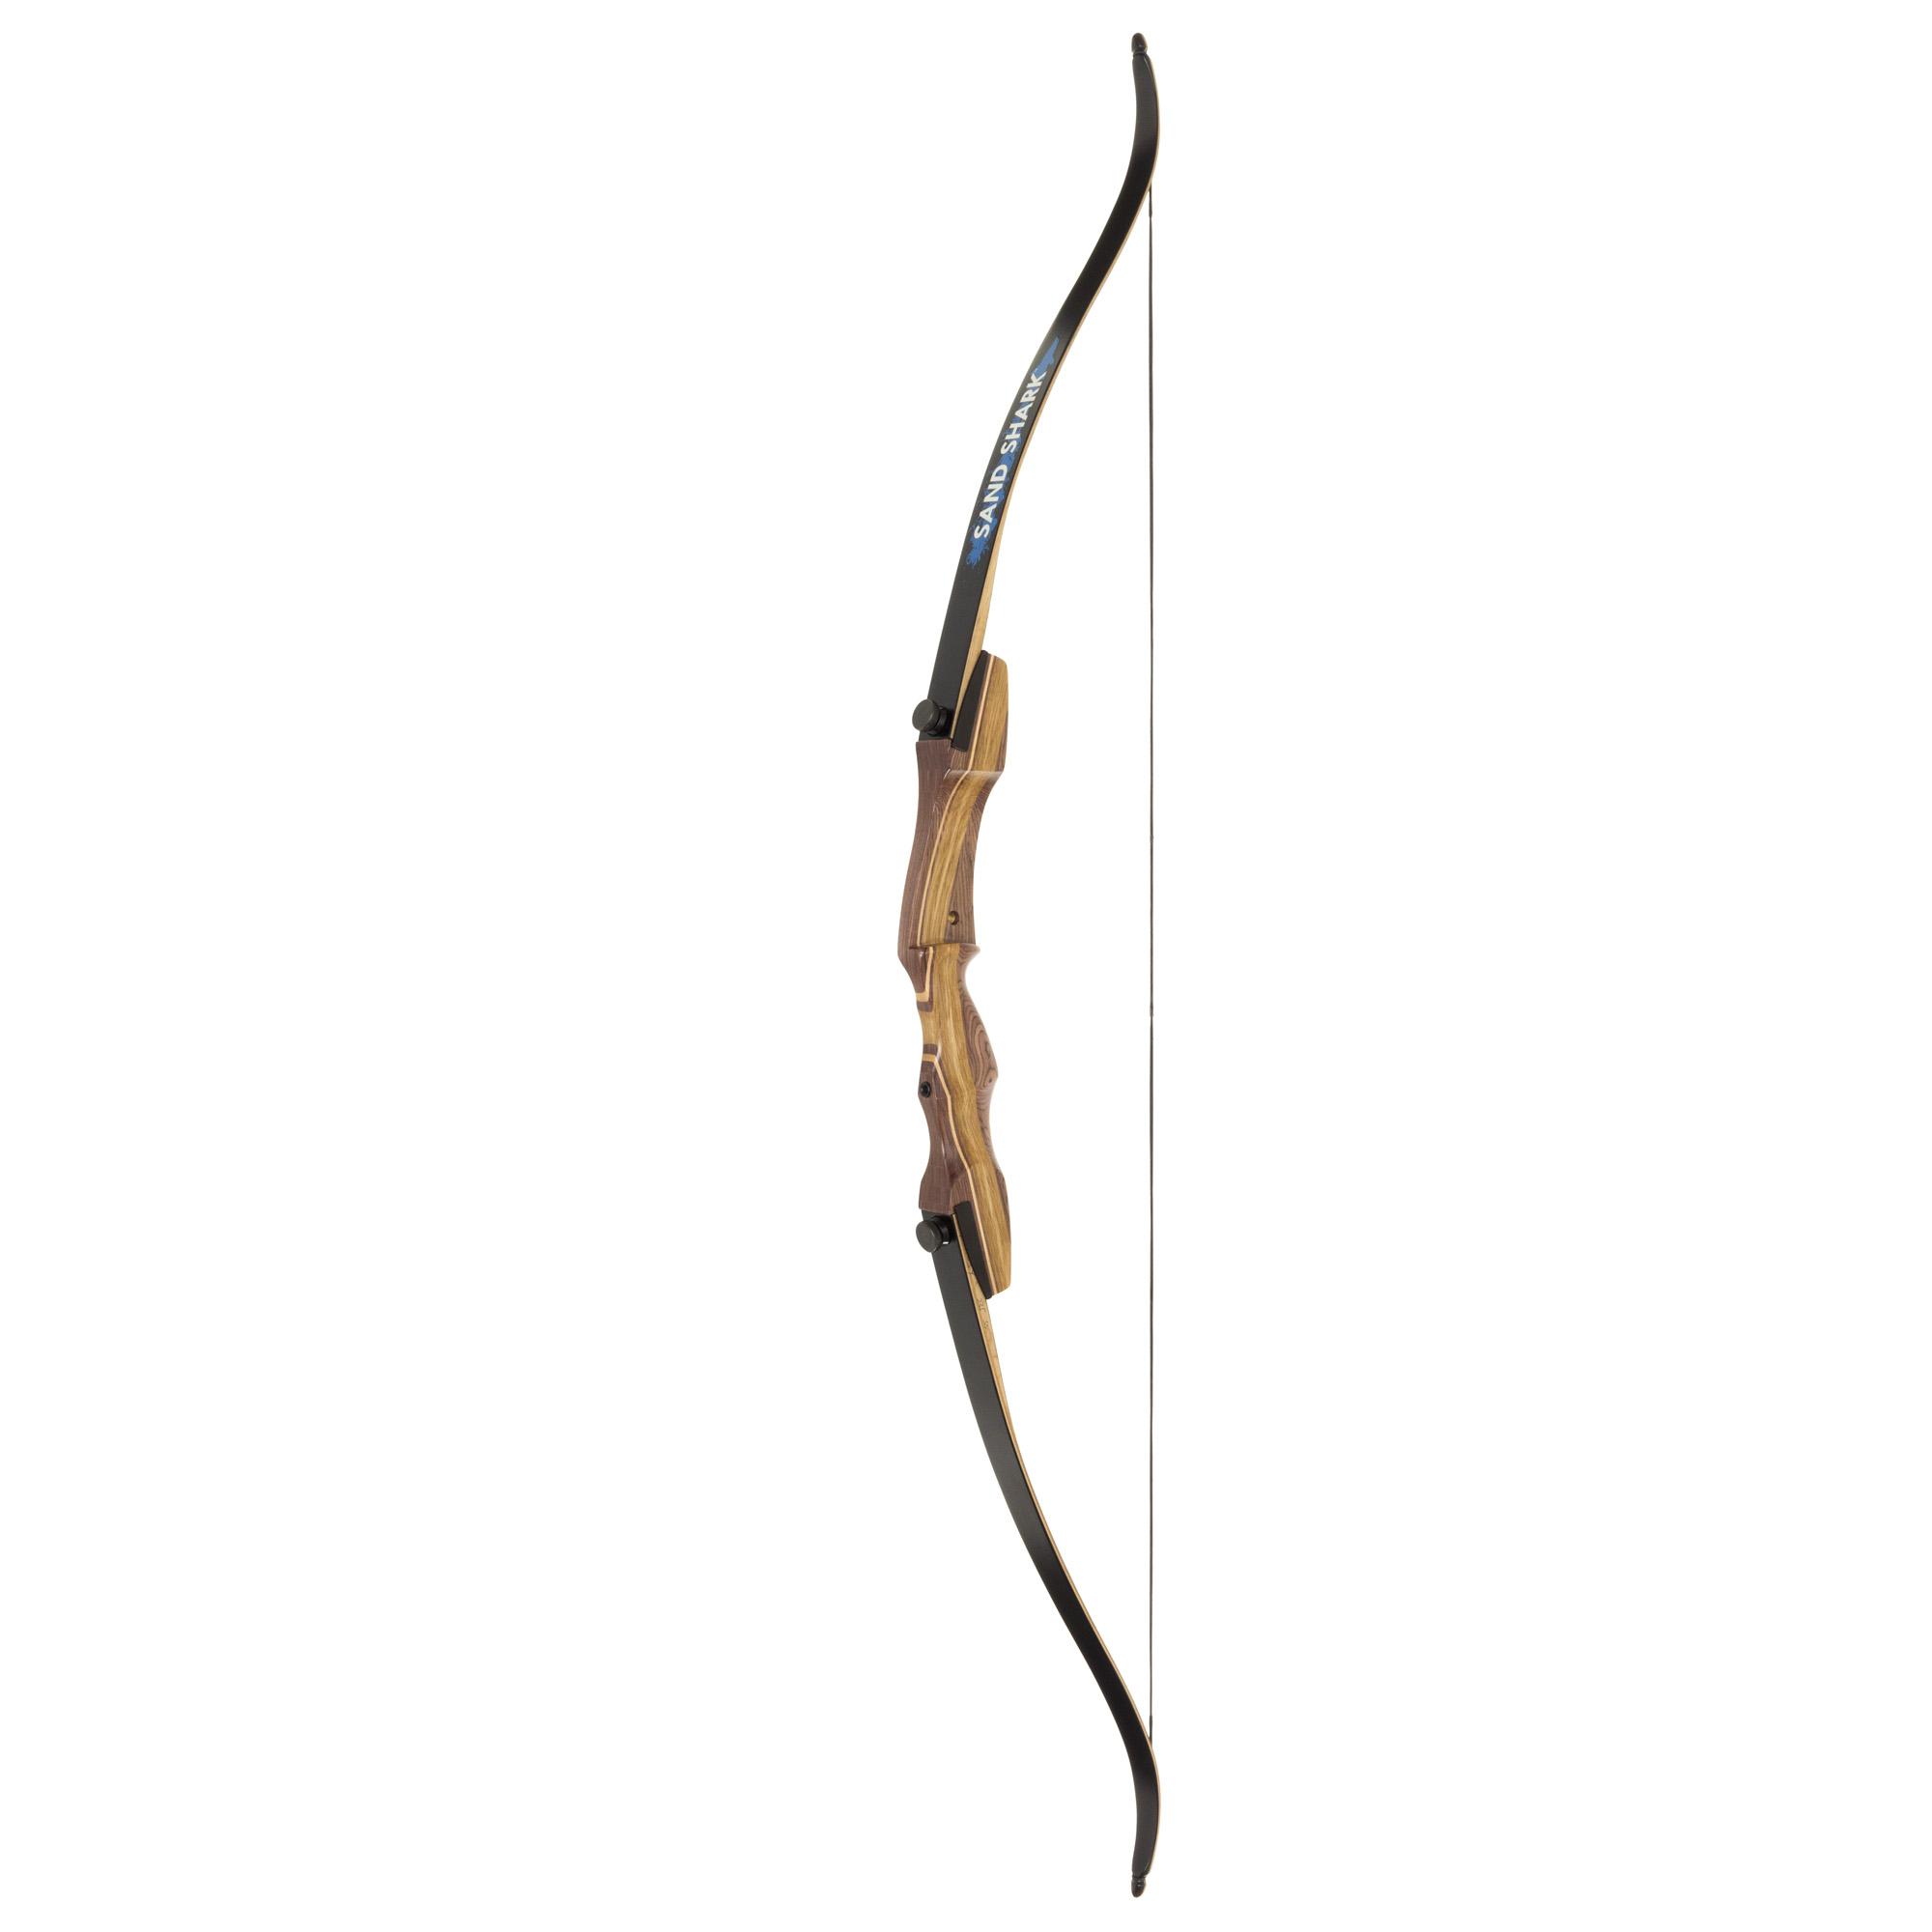 Sand Shark Recurve Bowfishing Bow